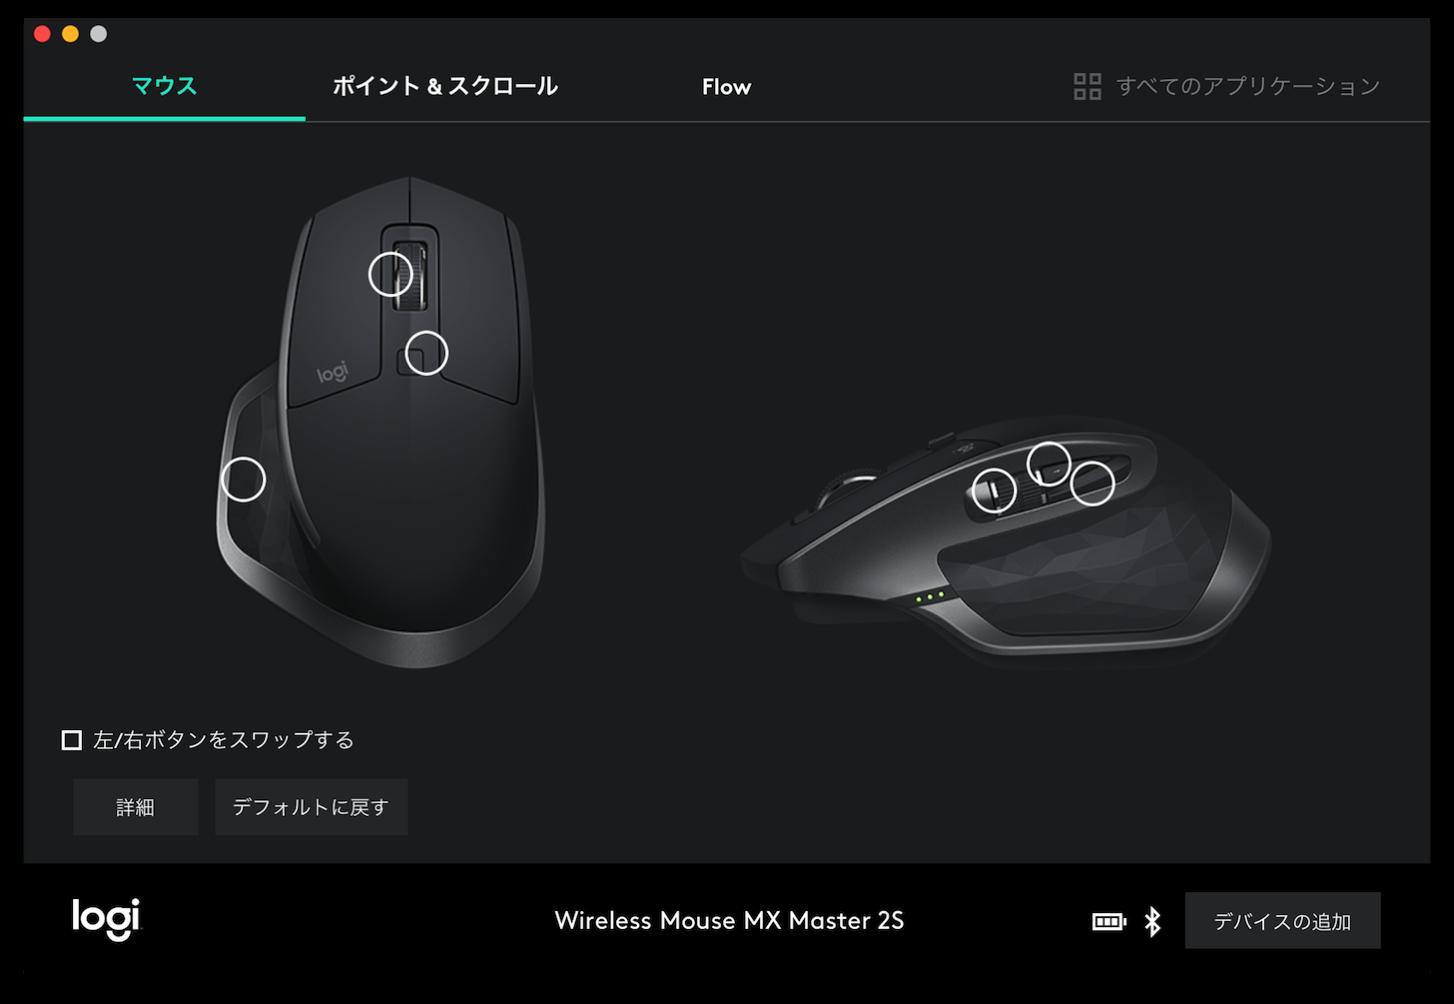 MX Master 2S setting 7